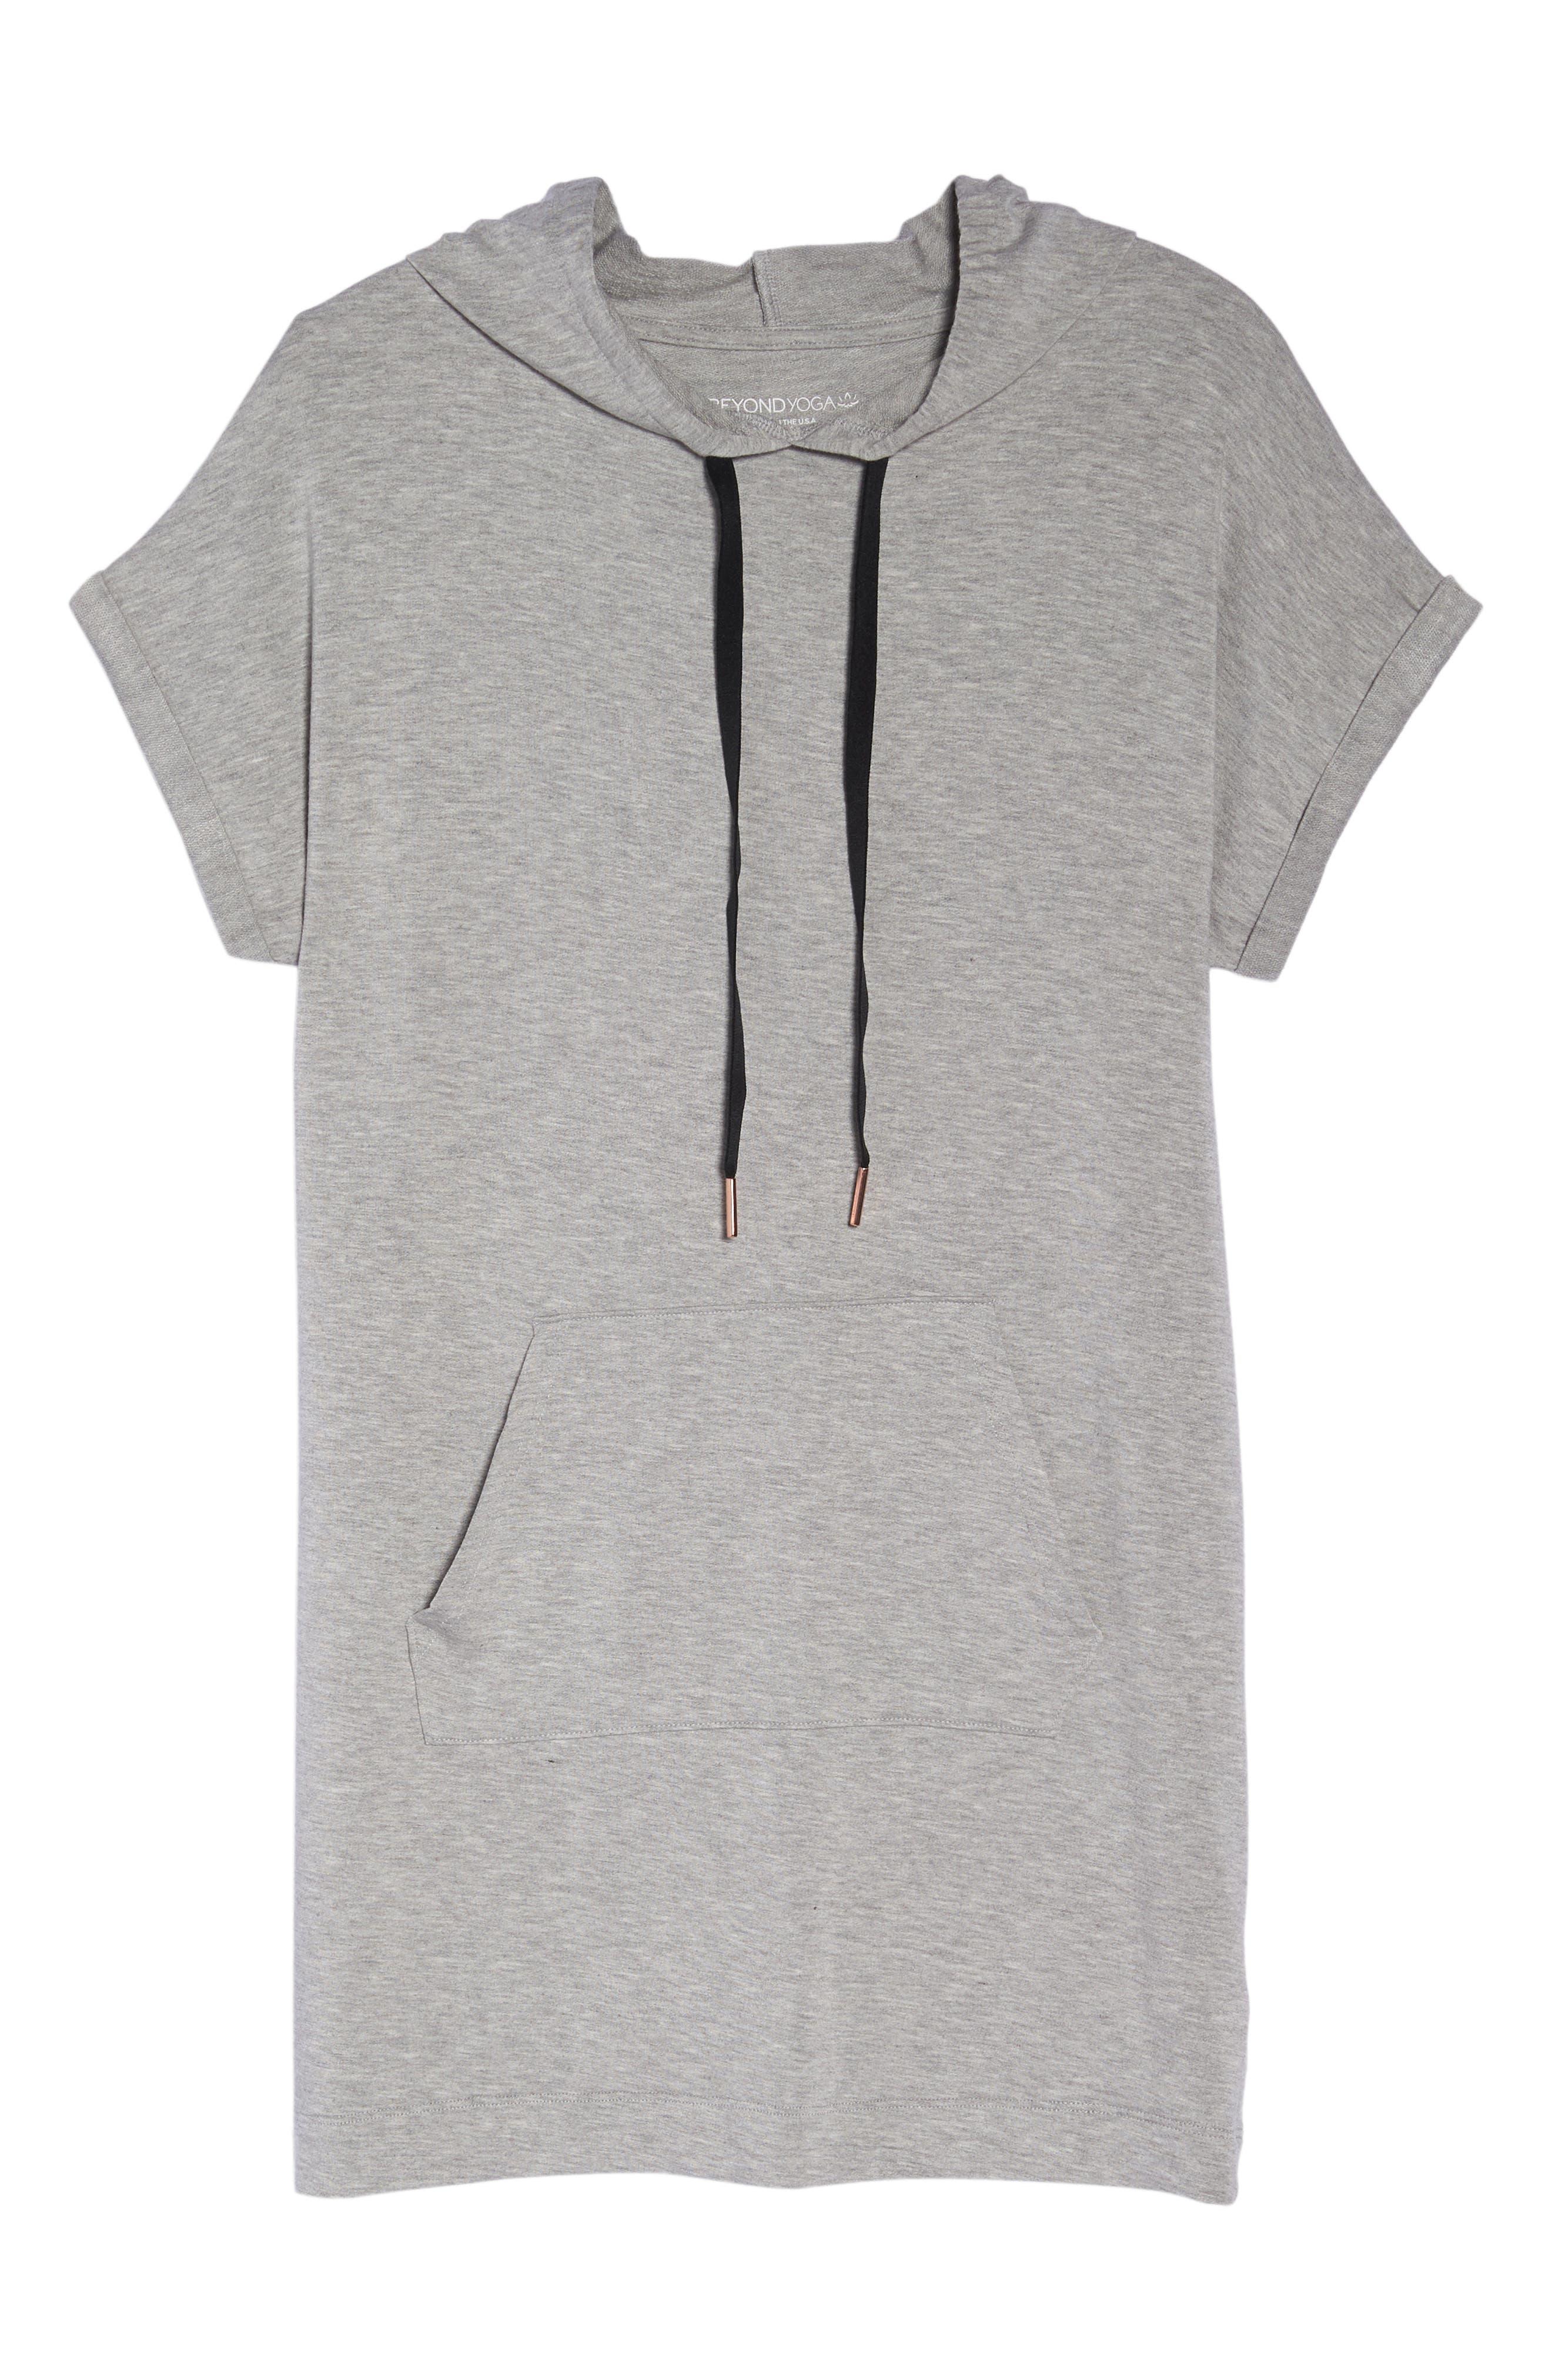 It's All Hoodie Hooded Sweatshirt Dress,                             Alternate thumbnail 7, color,                             LIGHT HEATHER GRAY